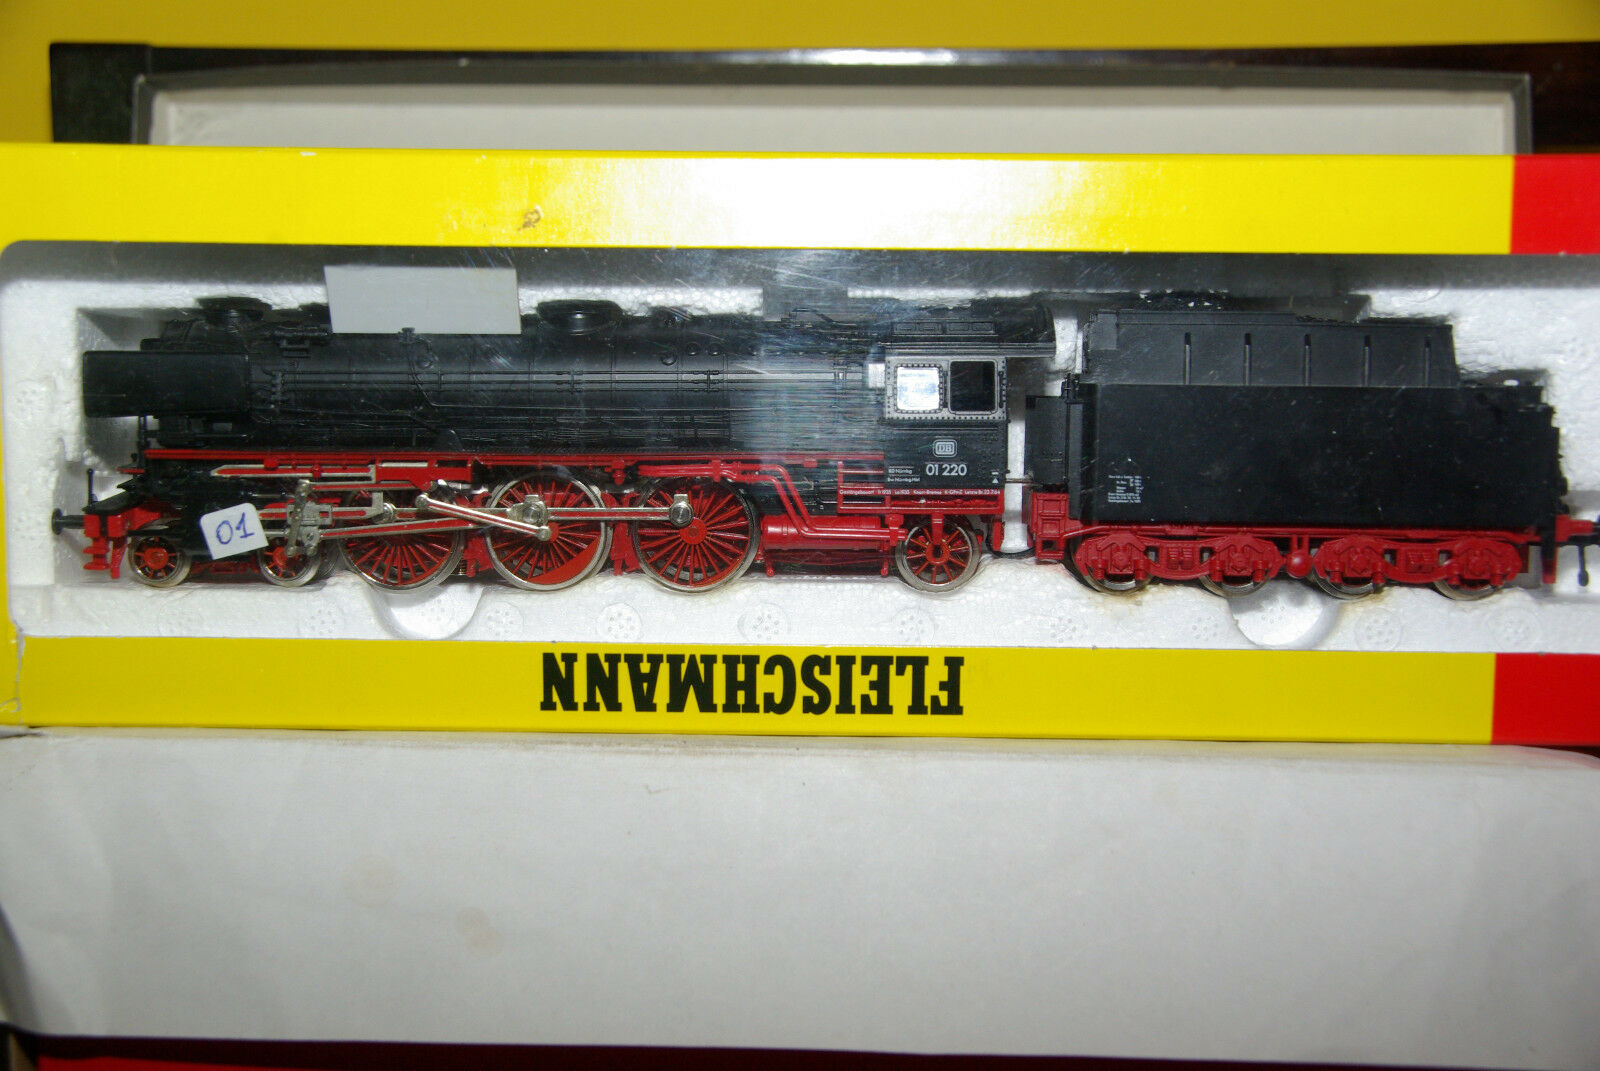 FLEISCHMANN HO IL GIGANTE NERO Prosso.FUMO ART.4170 SER 01 220 USATO +SCAT. TOP